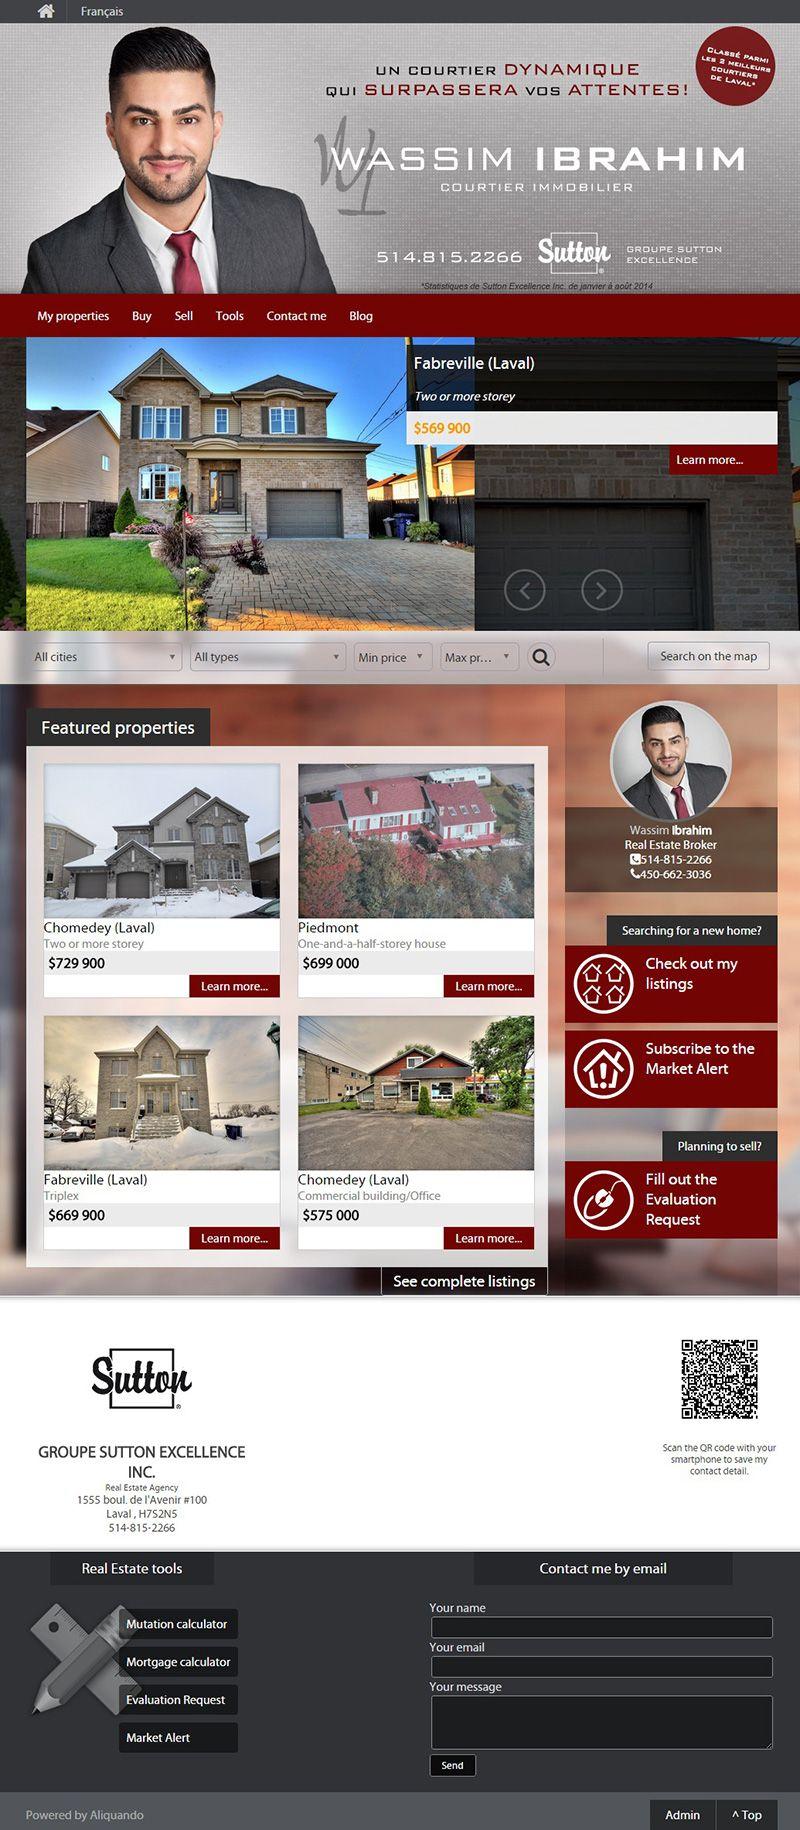 Wassim Ibrahim - courtier immobilier #SUTTON #Aliquando #immobilier #vendre #acheter #maison #habitation http://wassimibrahim.com/